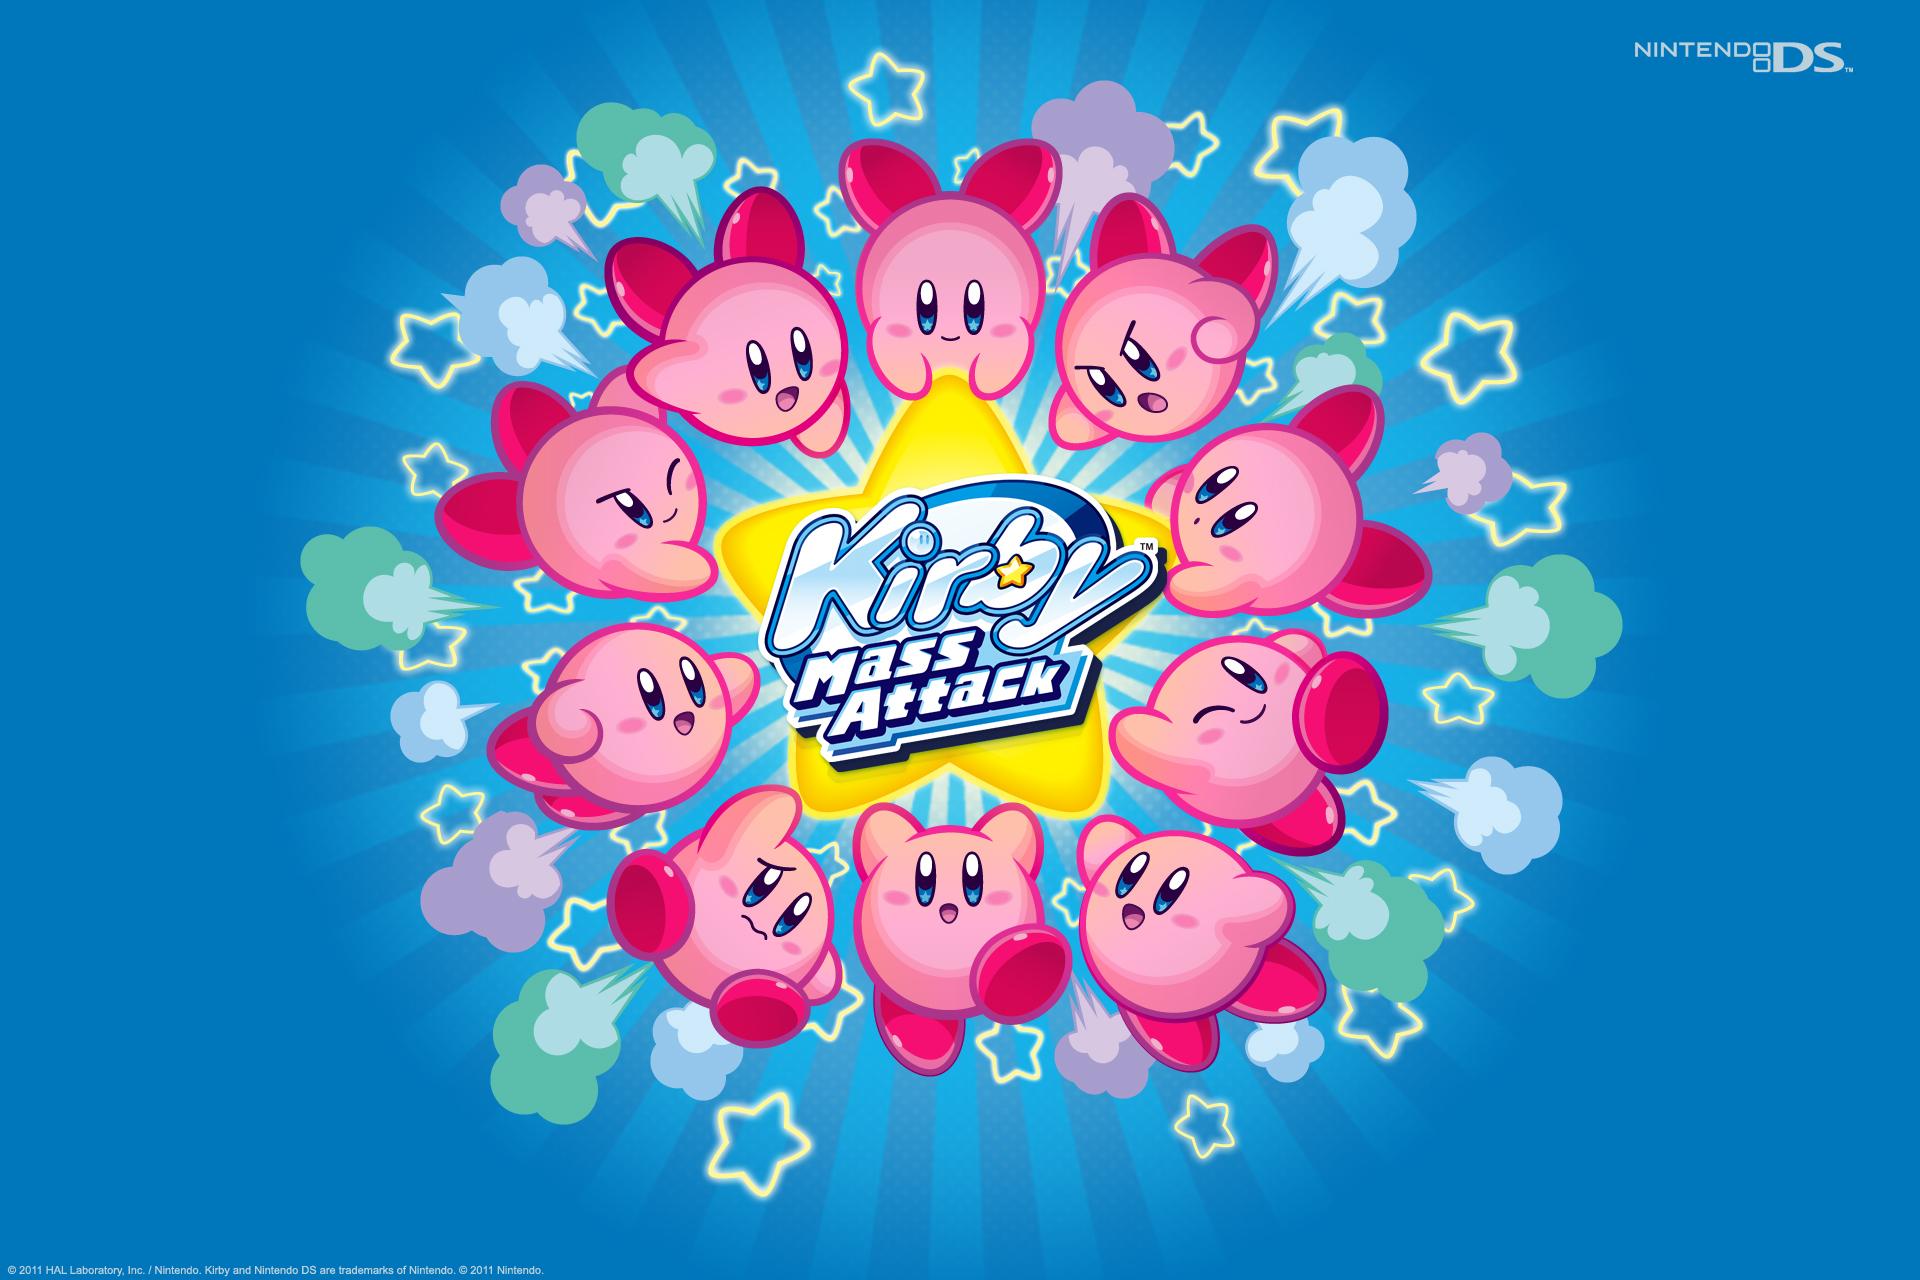 Resultado de imagen para Kirby Mass Attack Nds